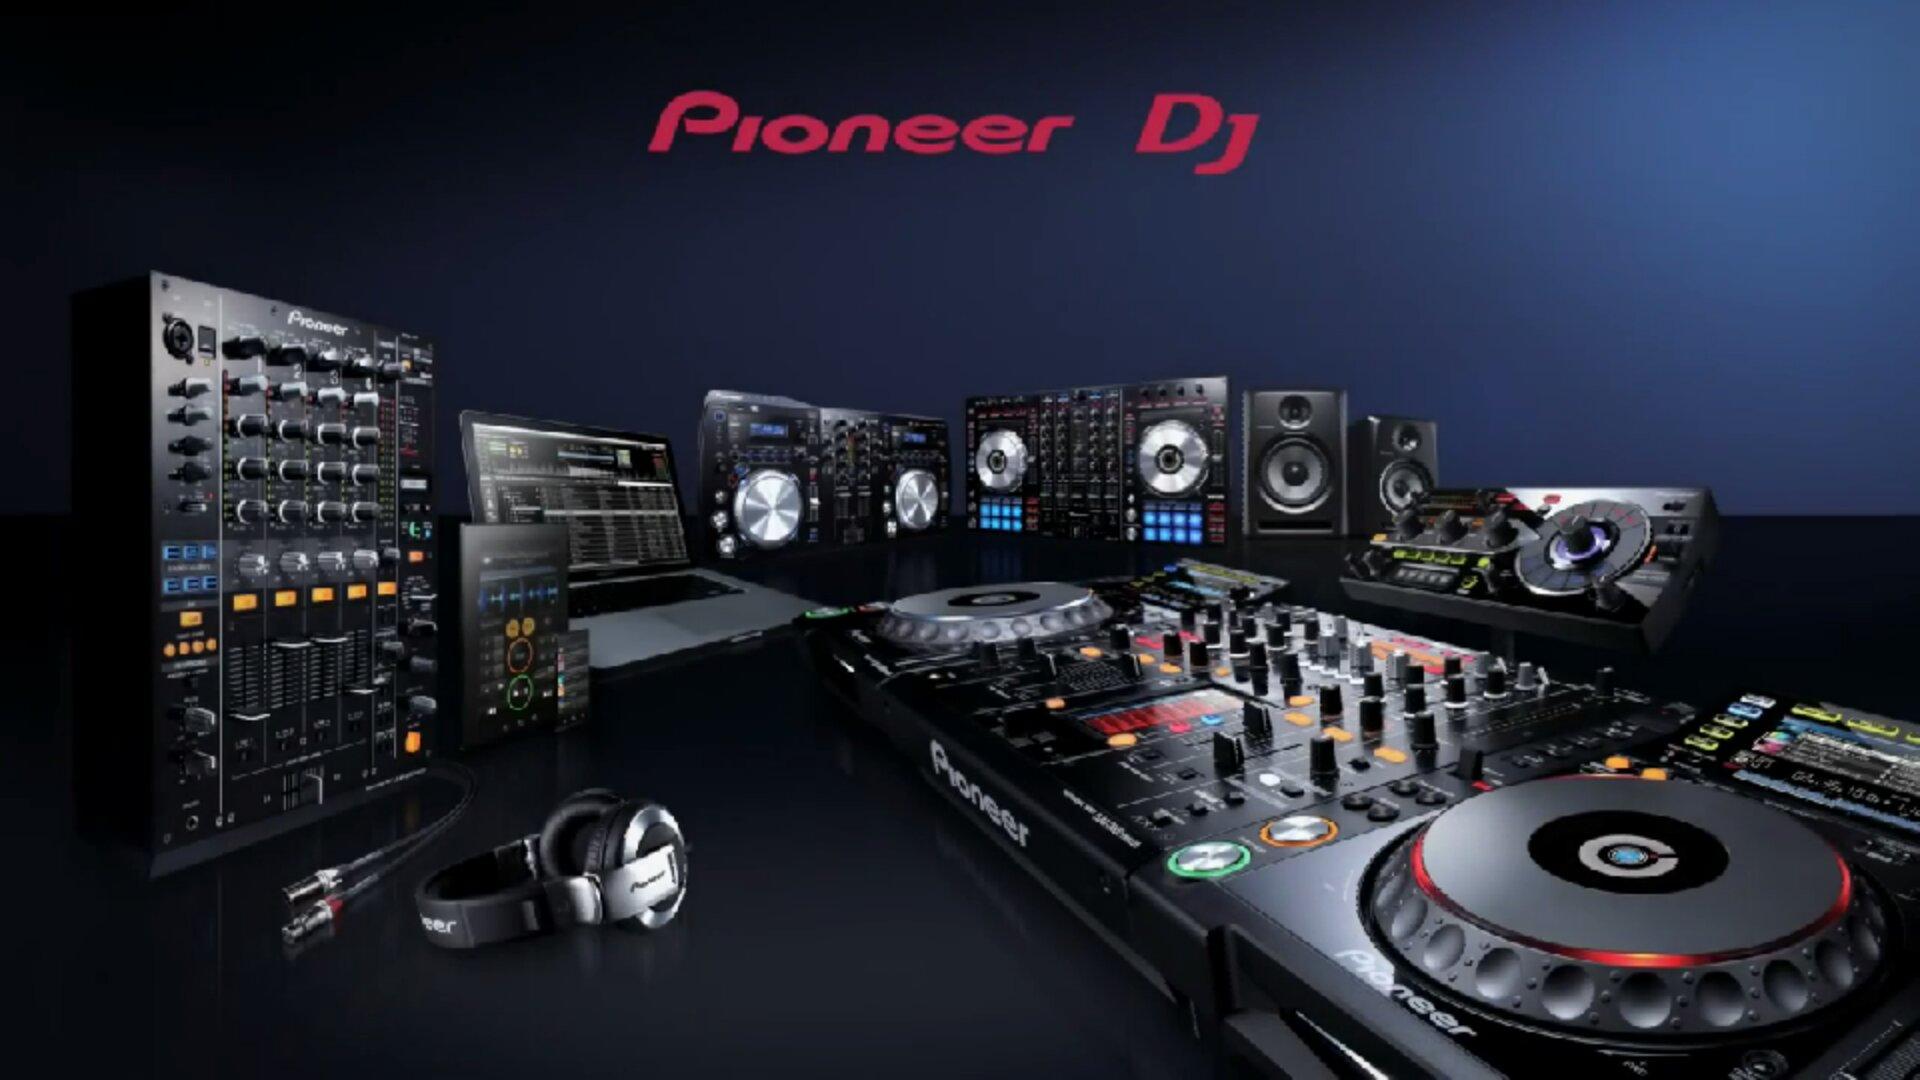 Pioneer Dj Wallpaper